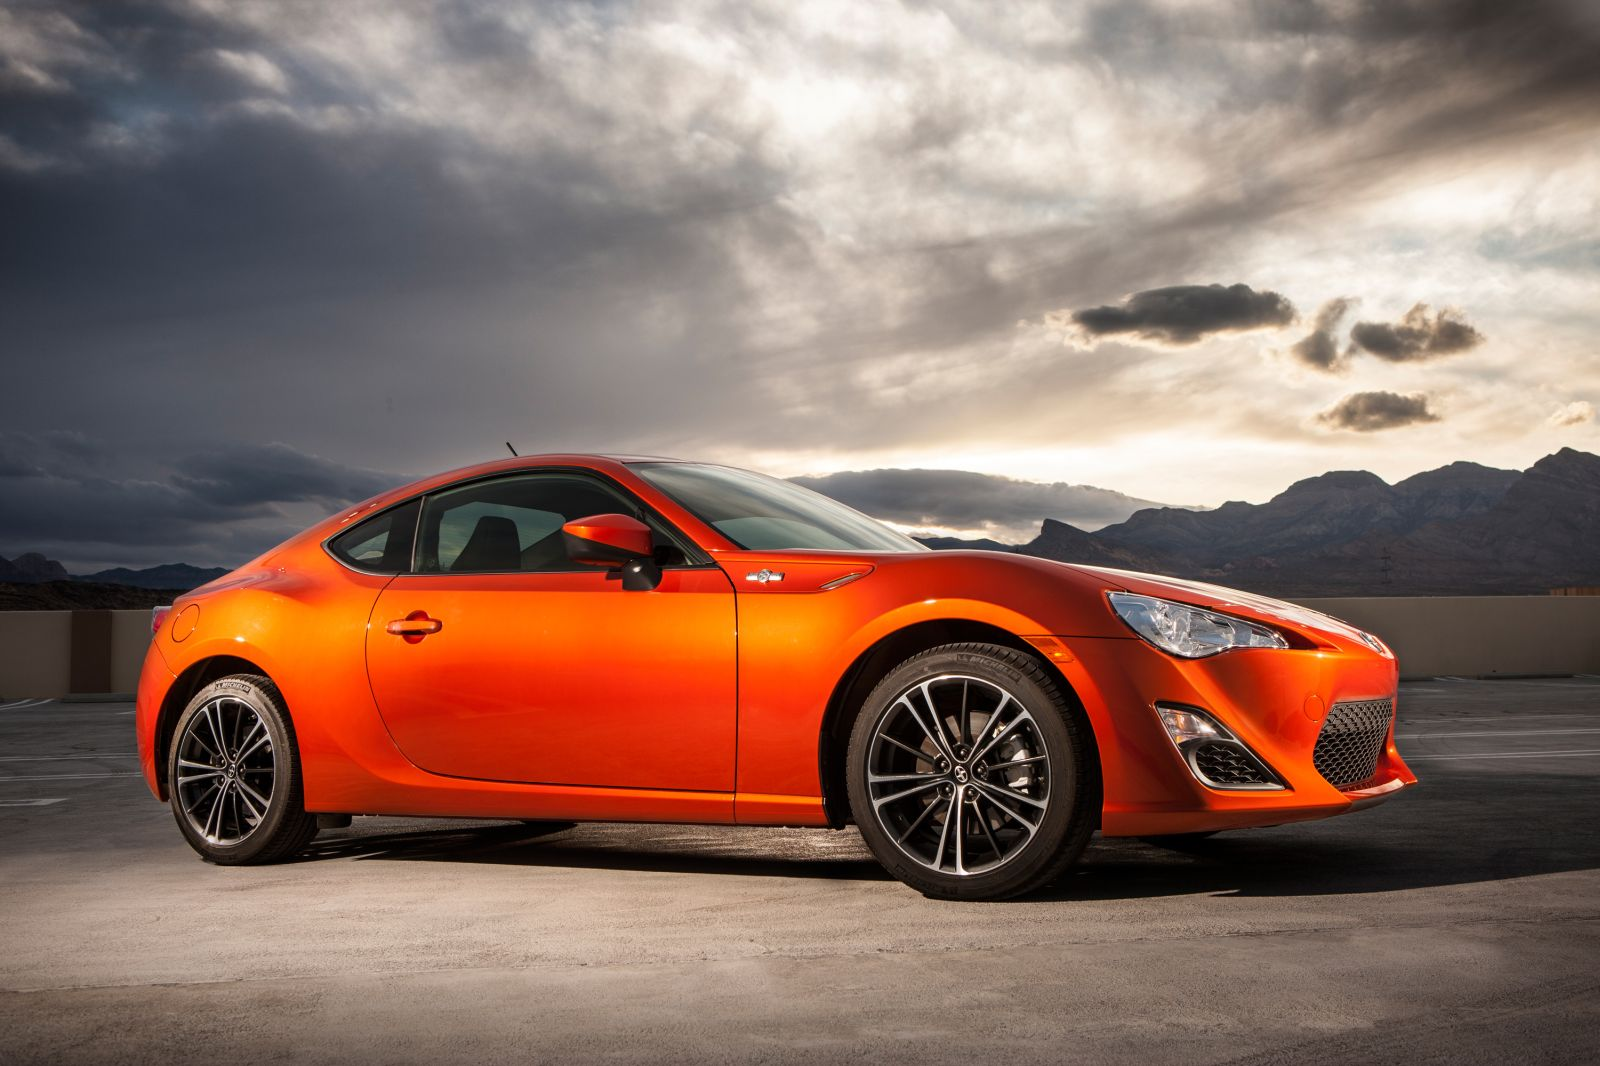 daily cars 2013 scion fr s sports car hits dealerships nationwide. Black Bedroom Furniture Sets. Home Design Ideas